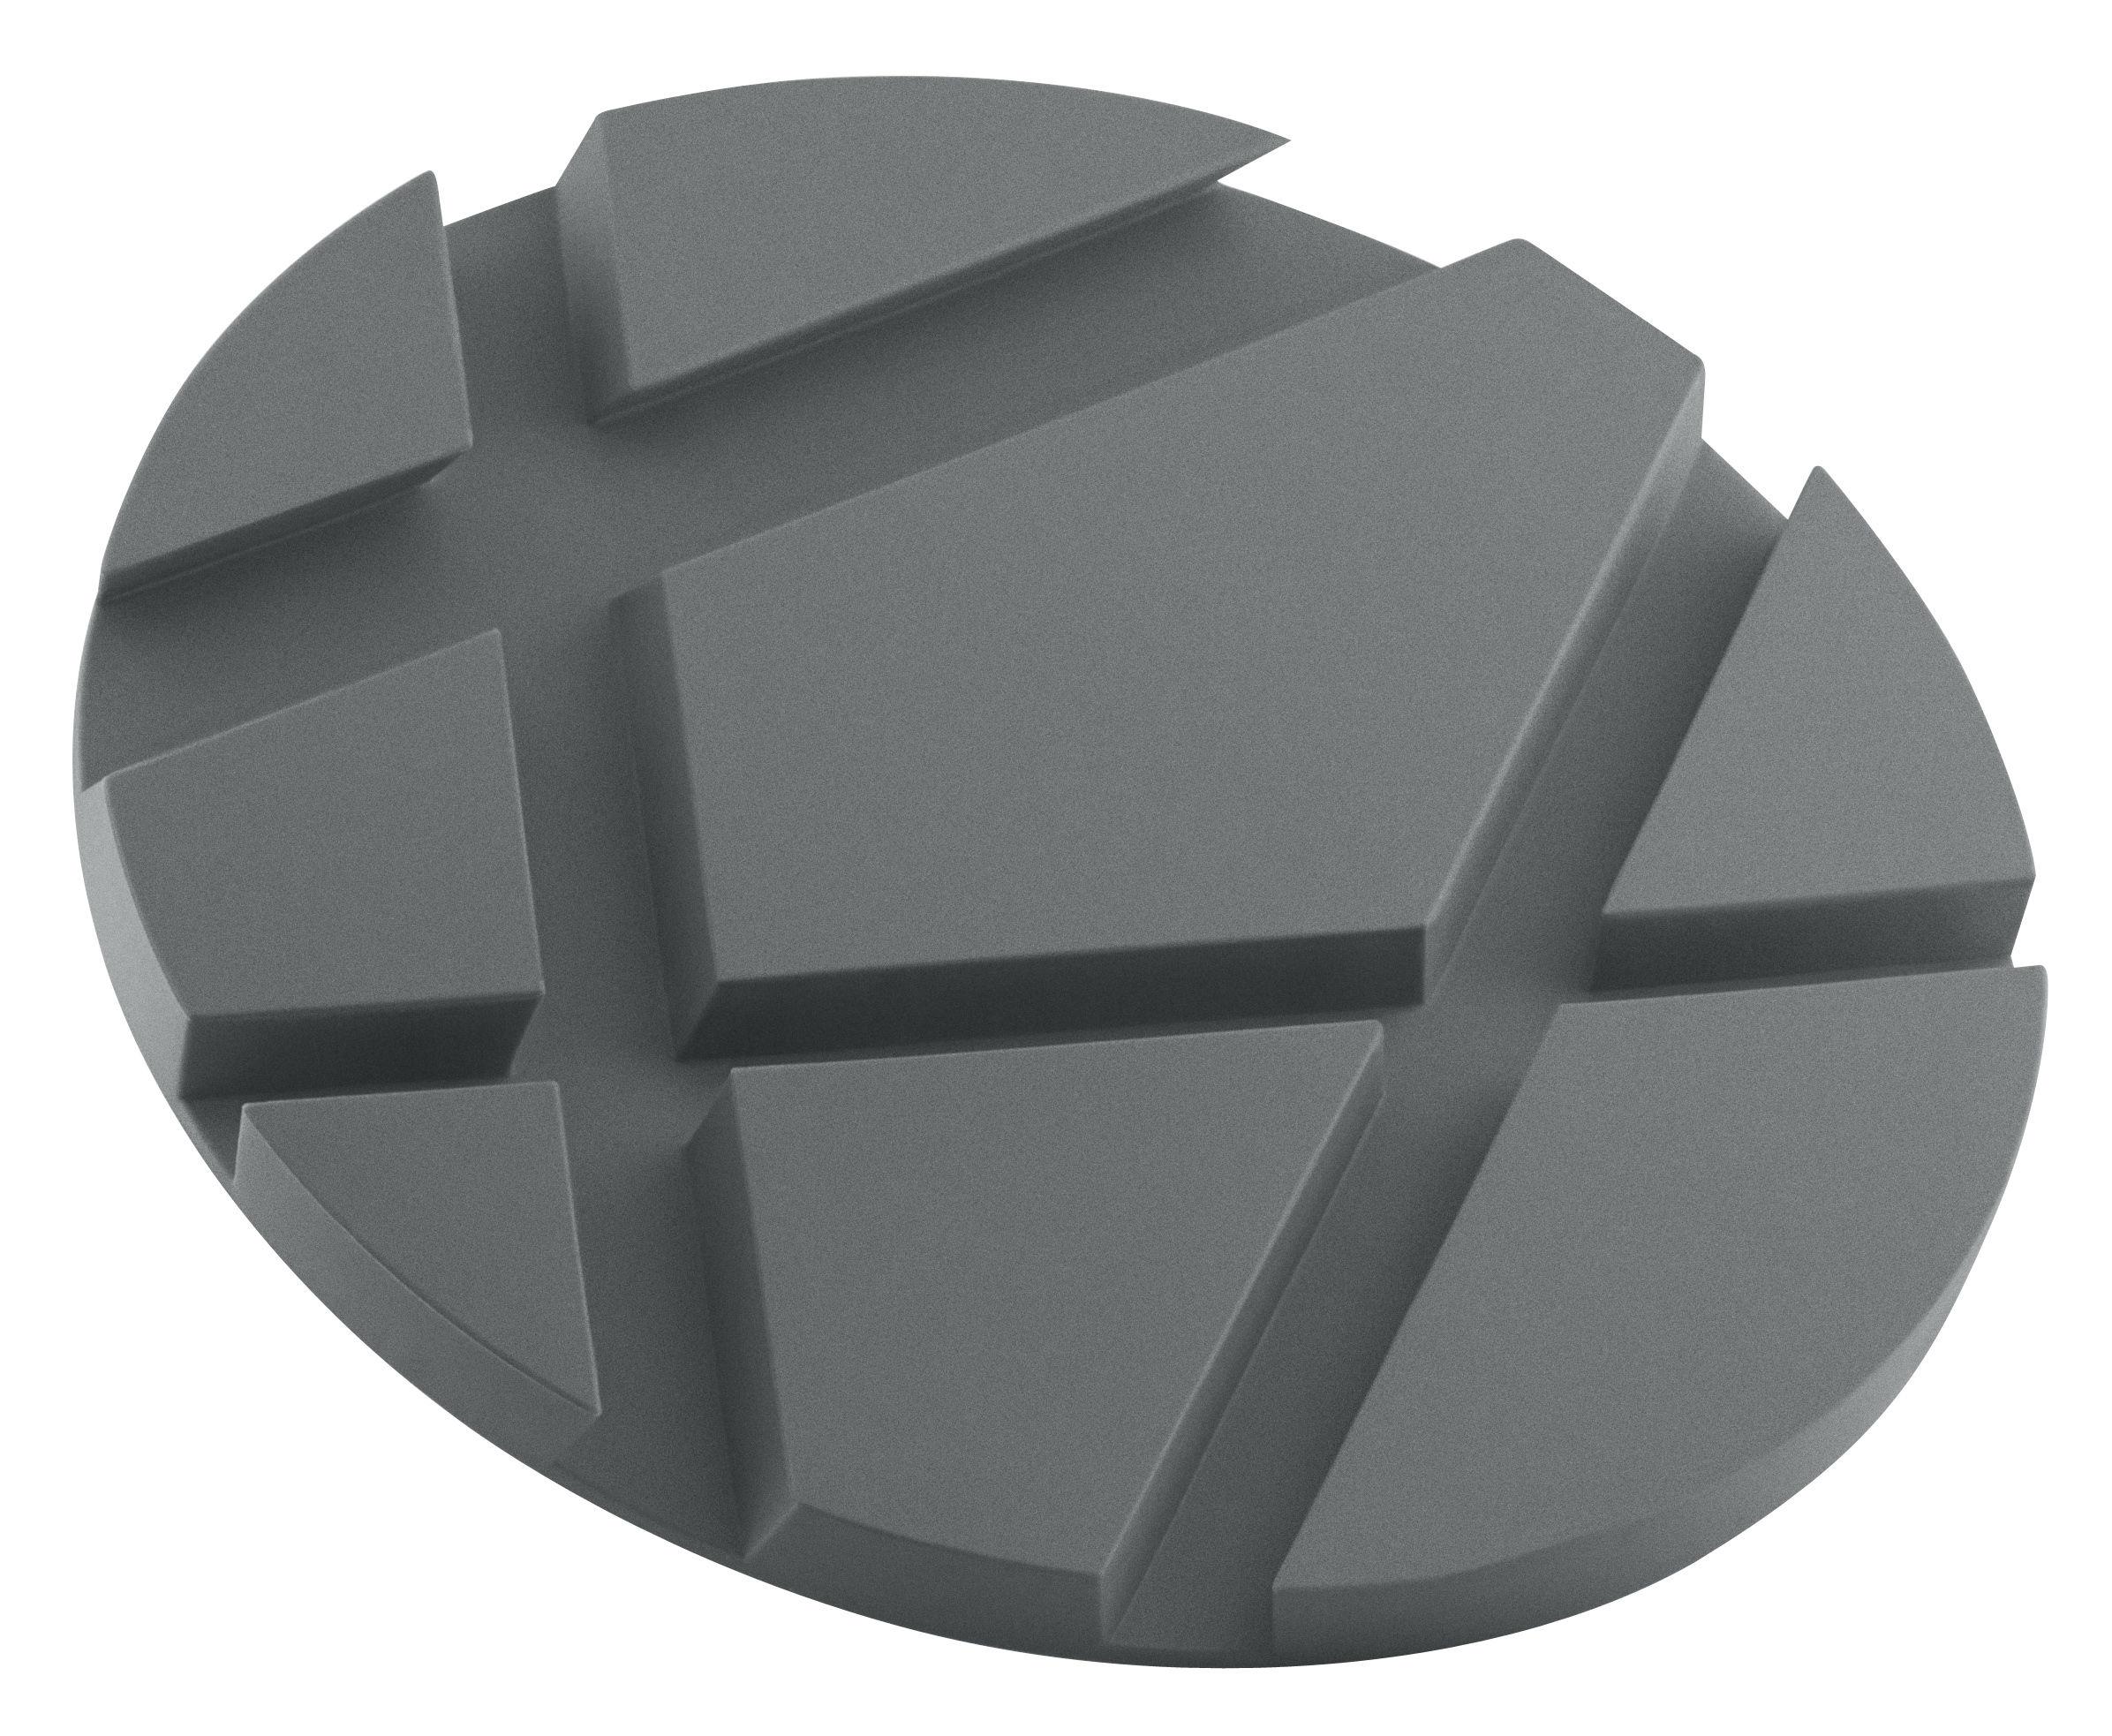 smartmat sottopentola support smartphones et tablettes grigio by eva solo made in design. Black Bedroom Furniture Sets. Home Design Ideas